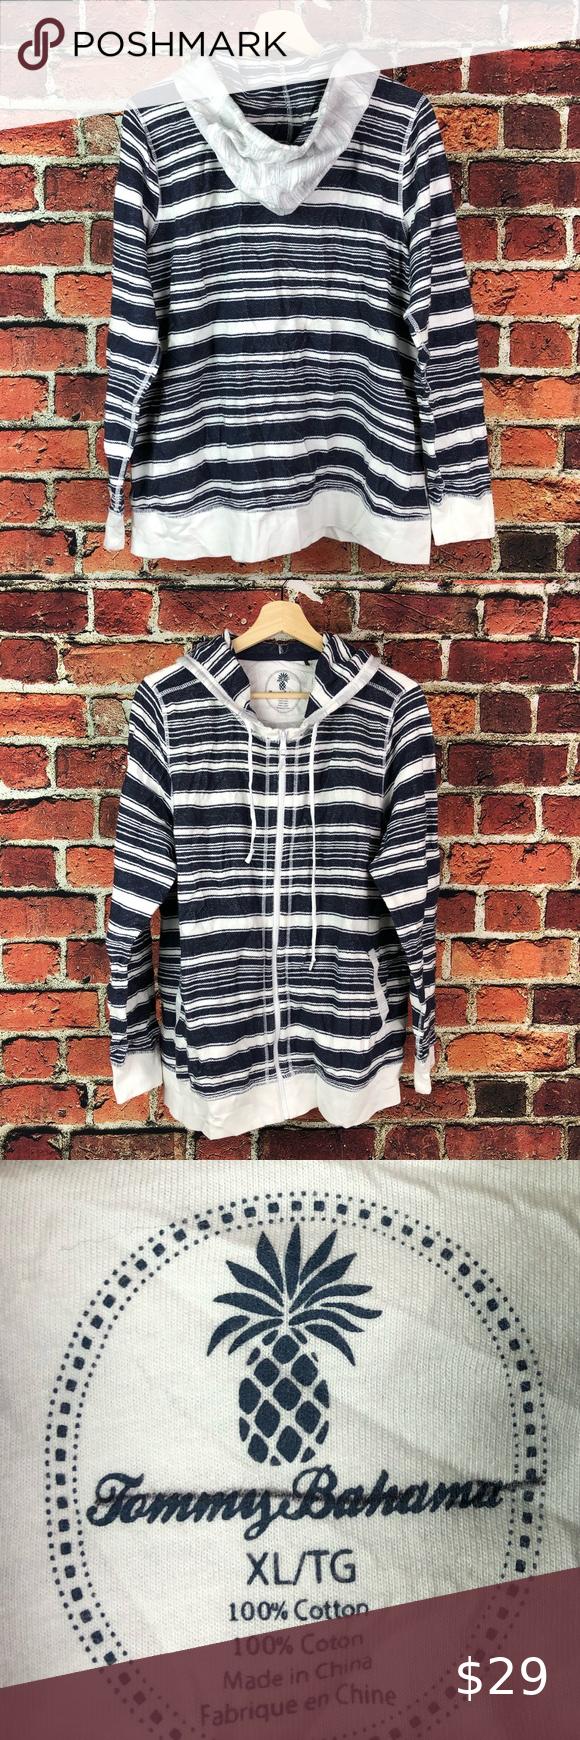 Tommy Bahama Mens Striped Sweatshirt Blue White In 2020 Striped Sweatshirts Mens Stripes Tommy Bahama Shirts [ 1740 x 580 Pixel ]